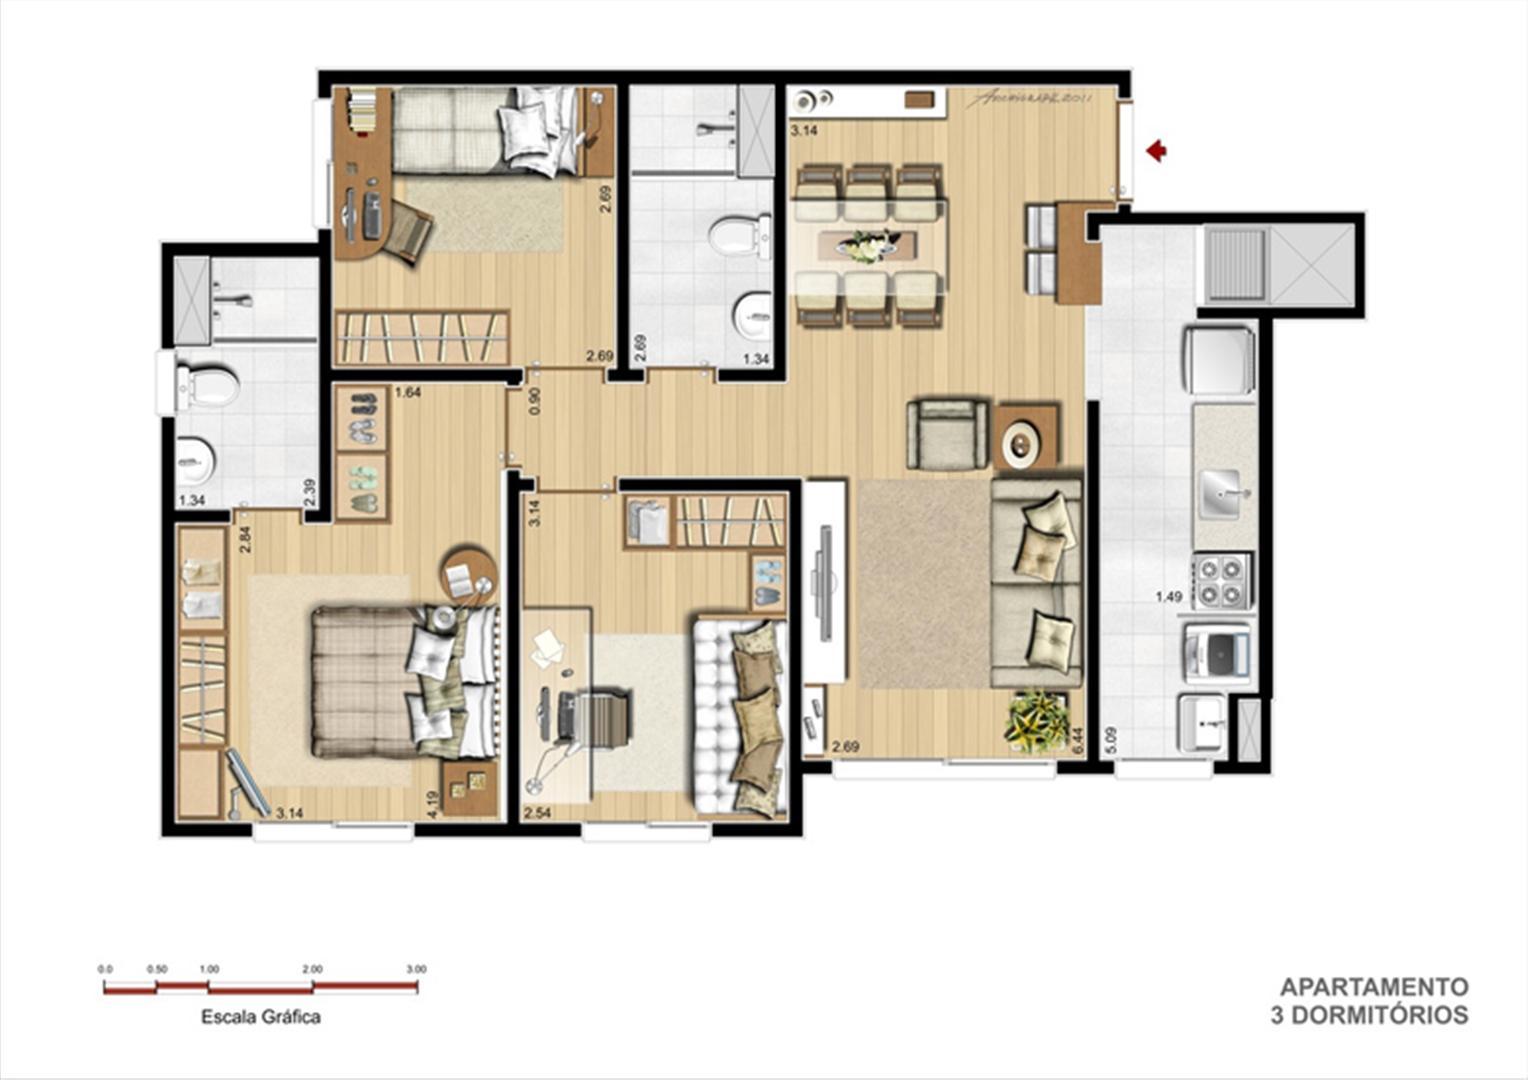 Tipo 3 dormitórios | Supera Condomínio Clube – Apartamento na  Cavalhada - Porto Alegre - Rio Grande do Sul